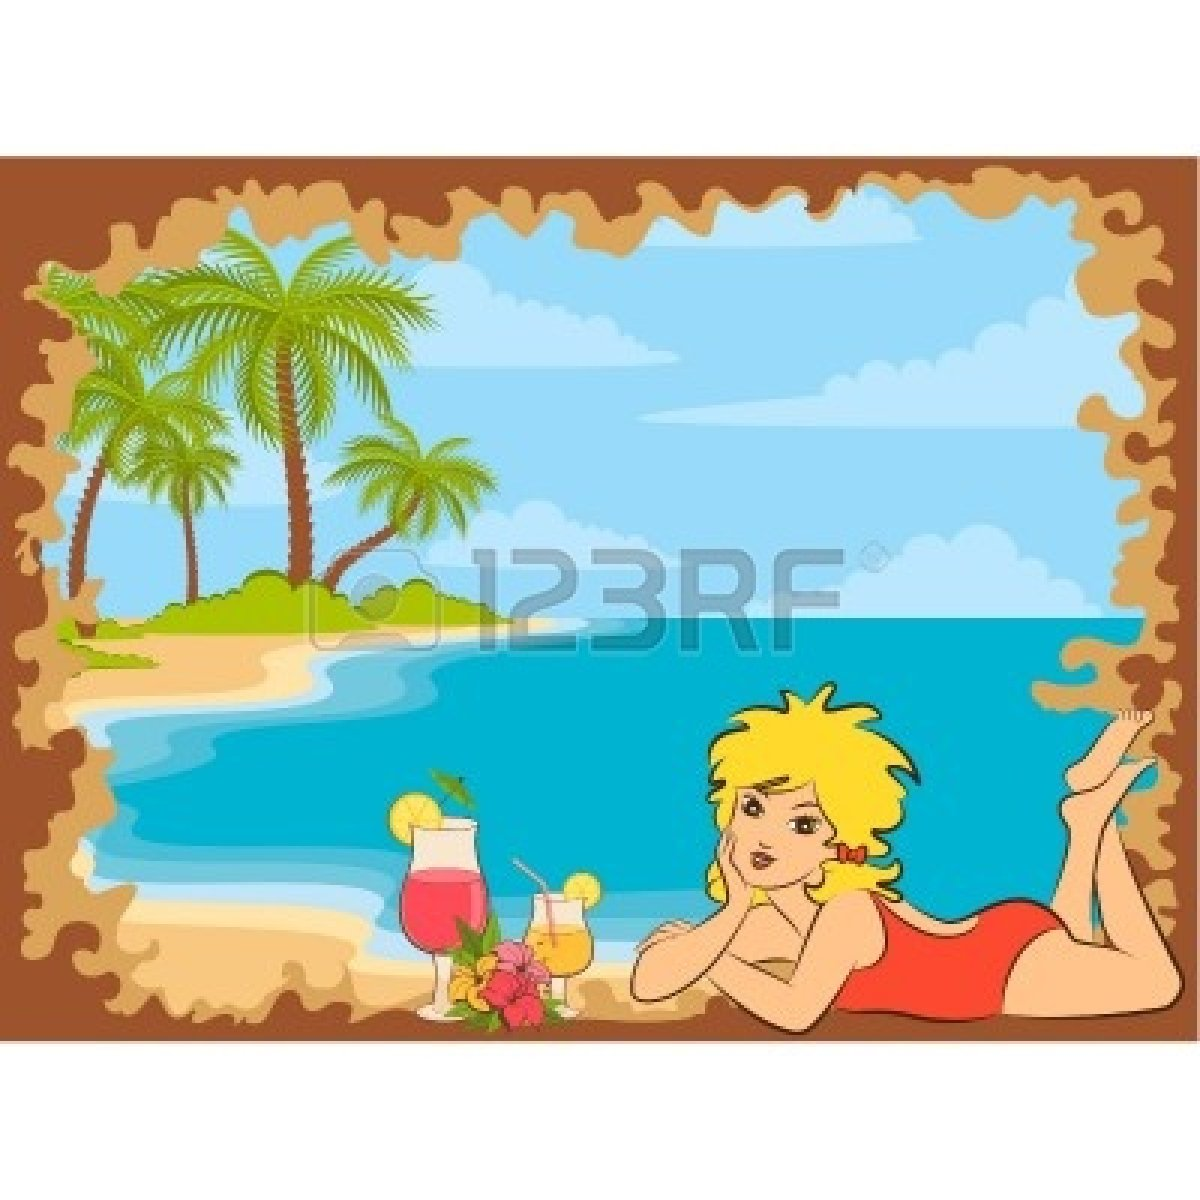 palm-tree-beach-sunset-10545146-beautiful-small-girl-on-the-beach-with ...